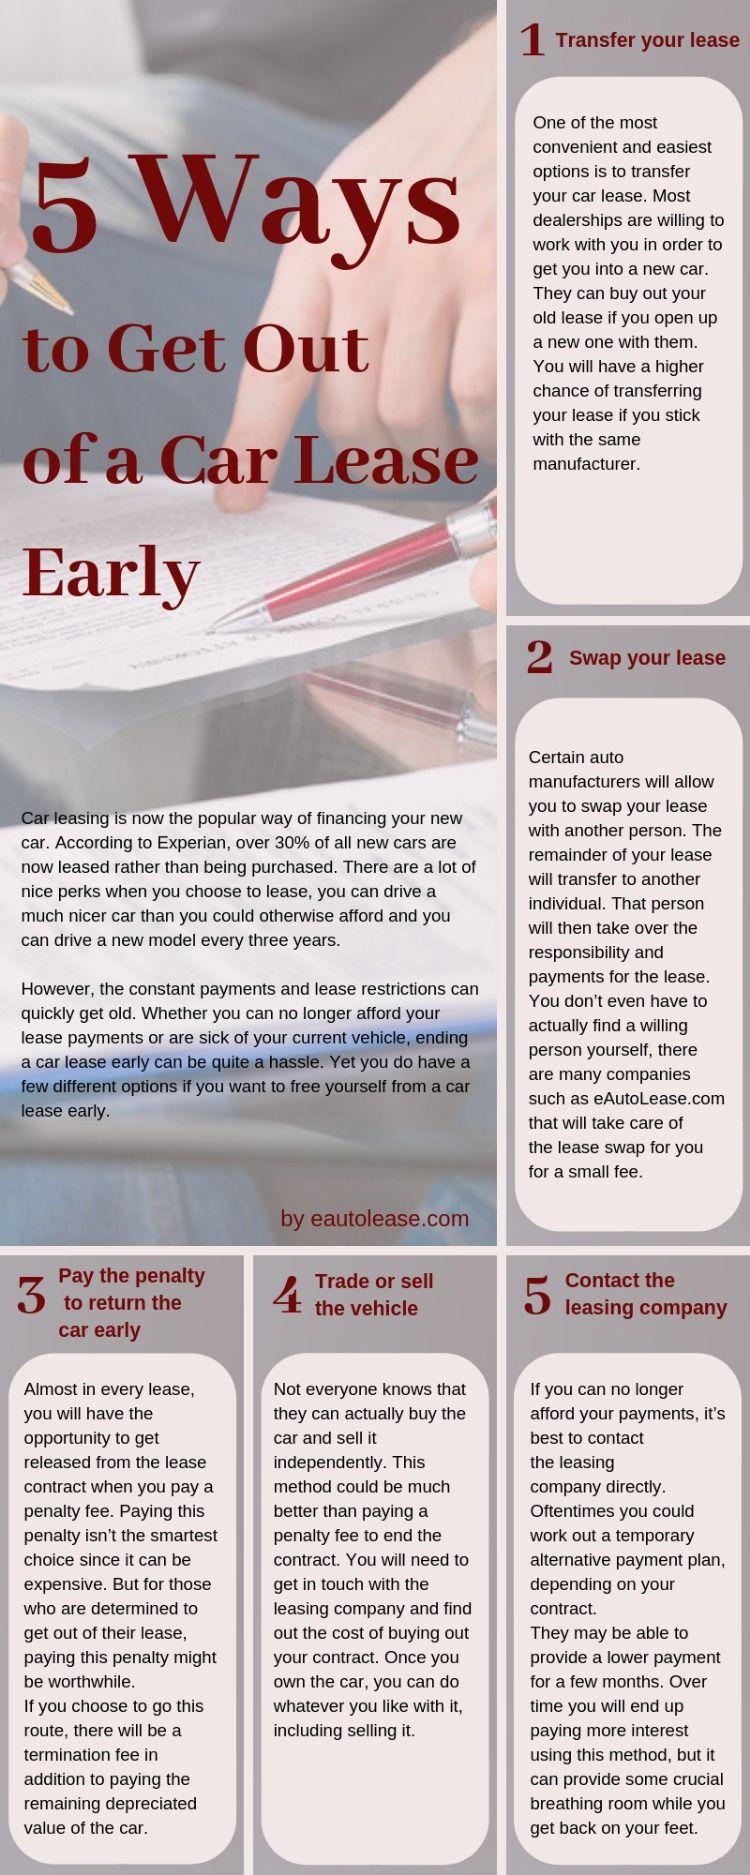 8144a401ce8f5b3d1861675666414e37 - How To Get Out Of A Ford Lease Early